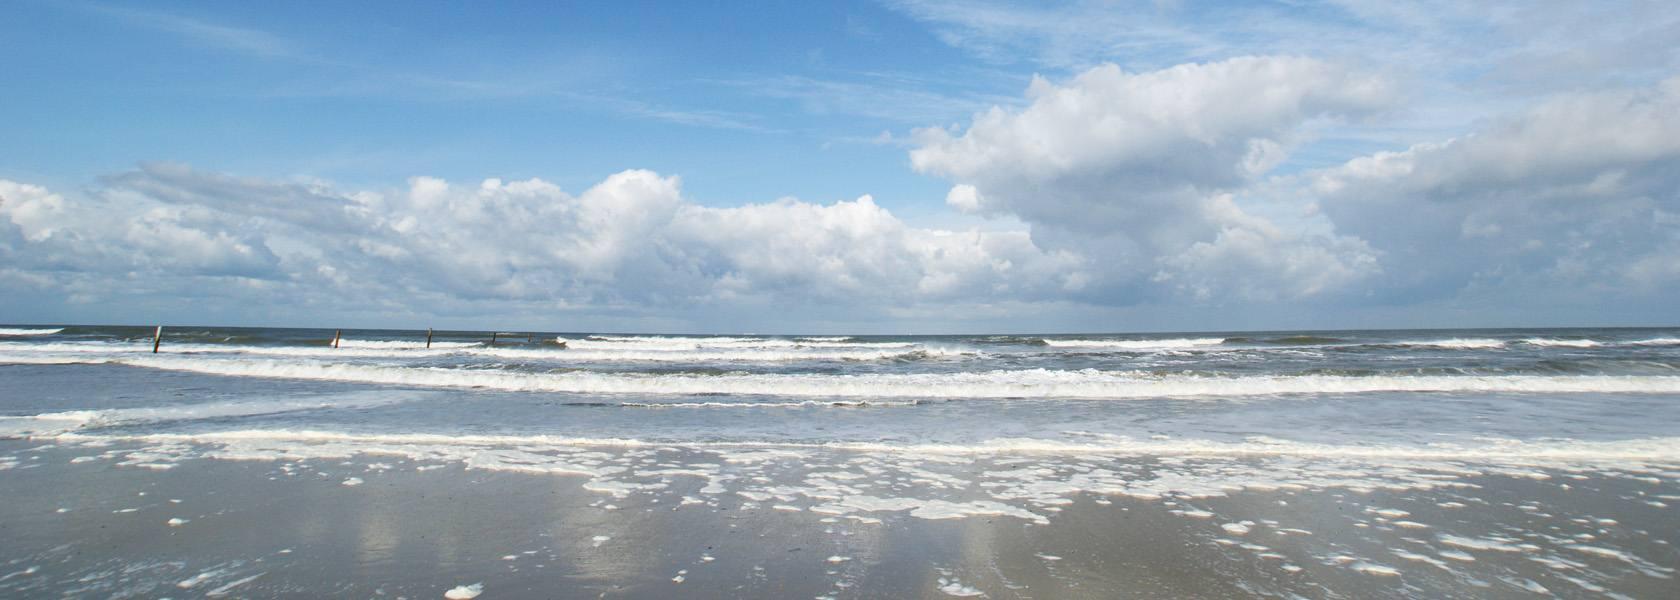 Wellen am Strand, © Dirk Topel